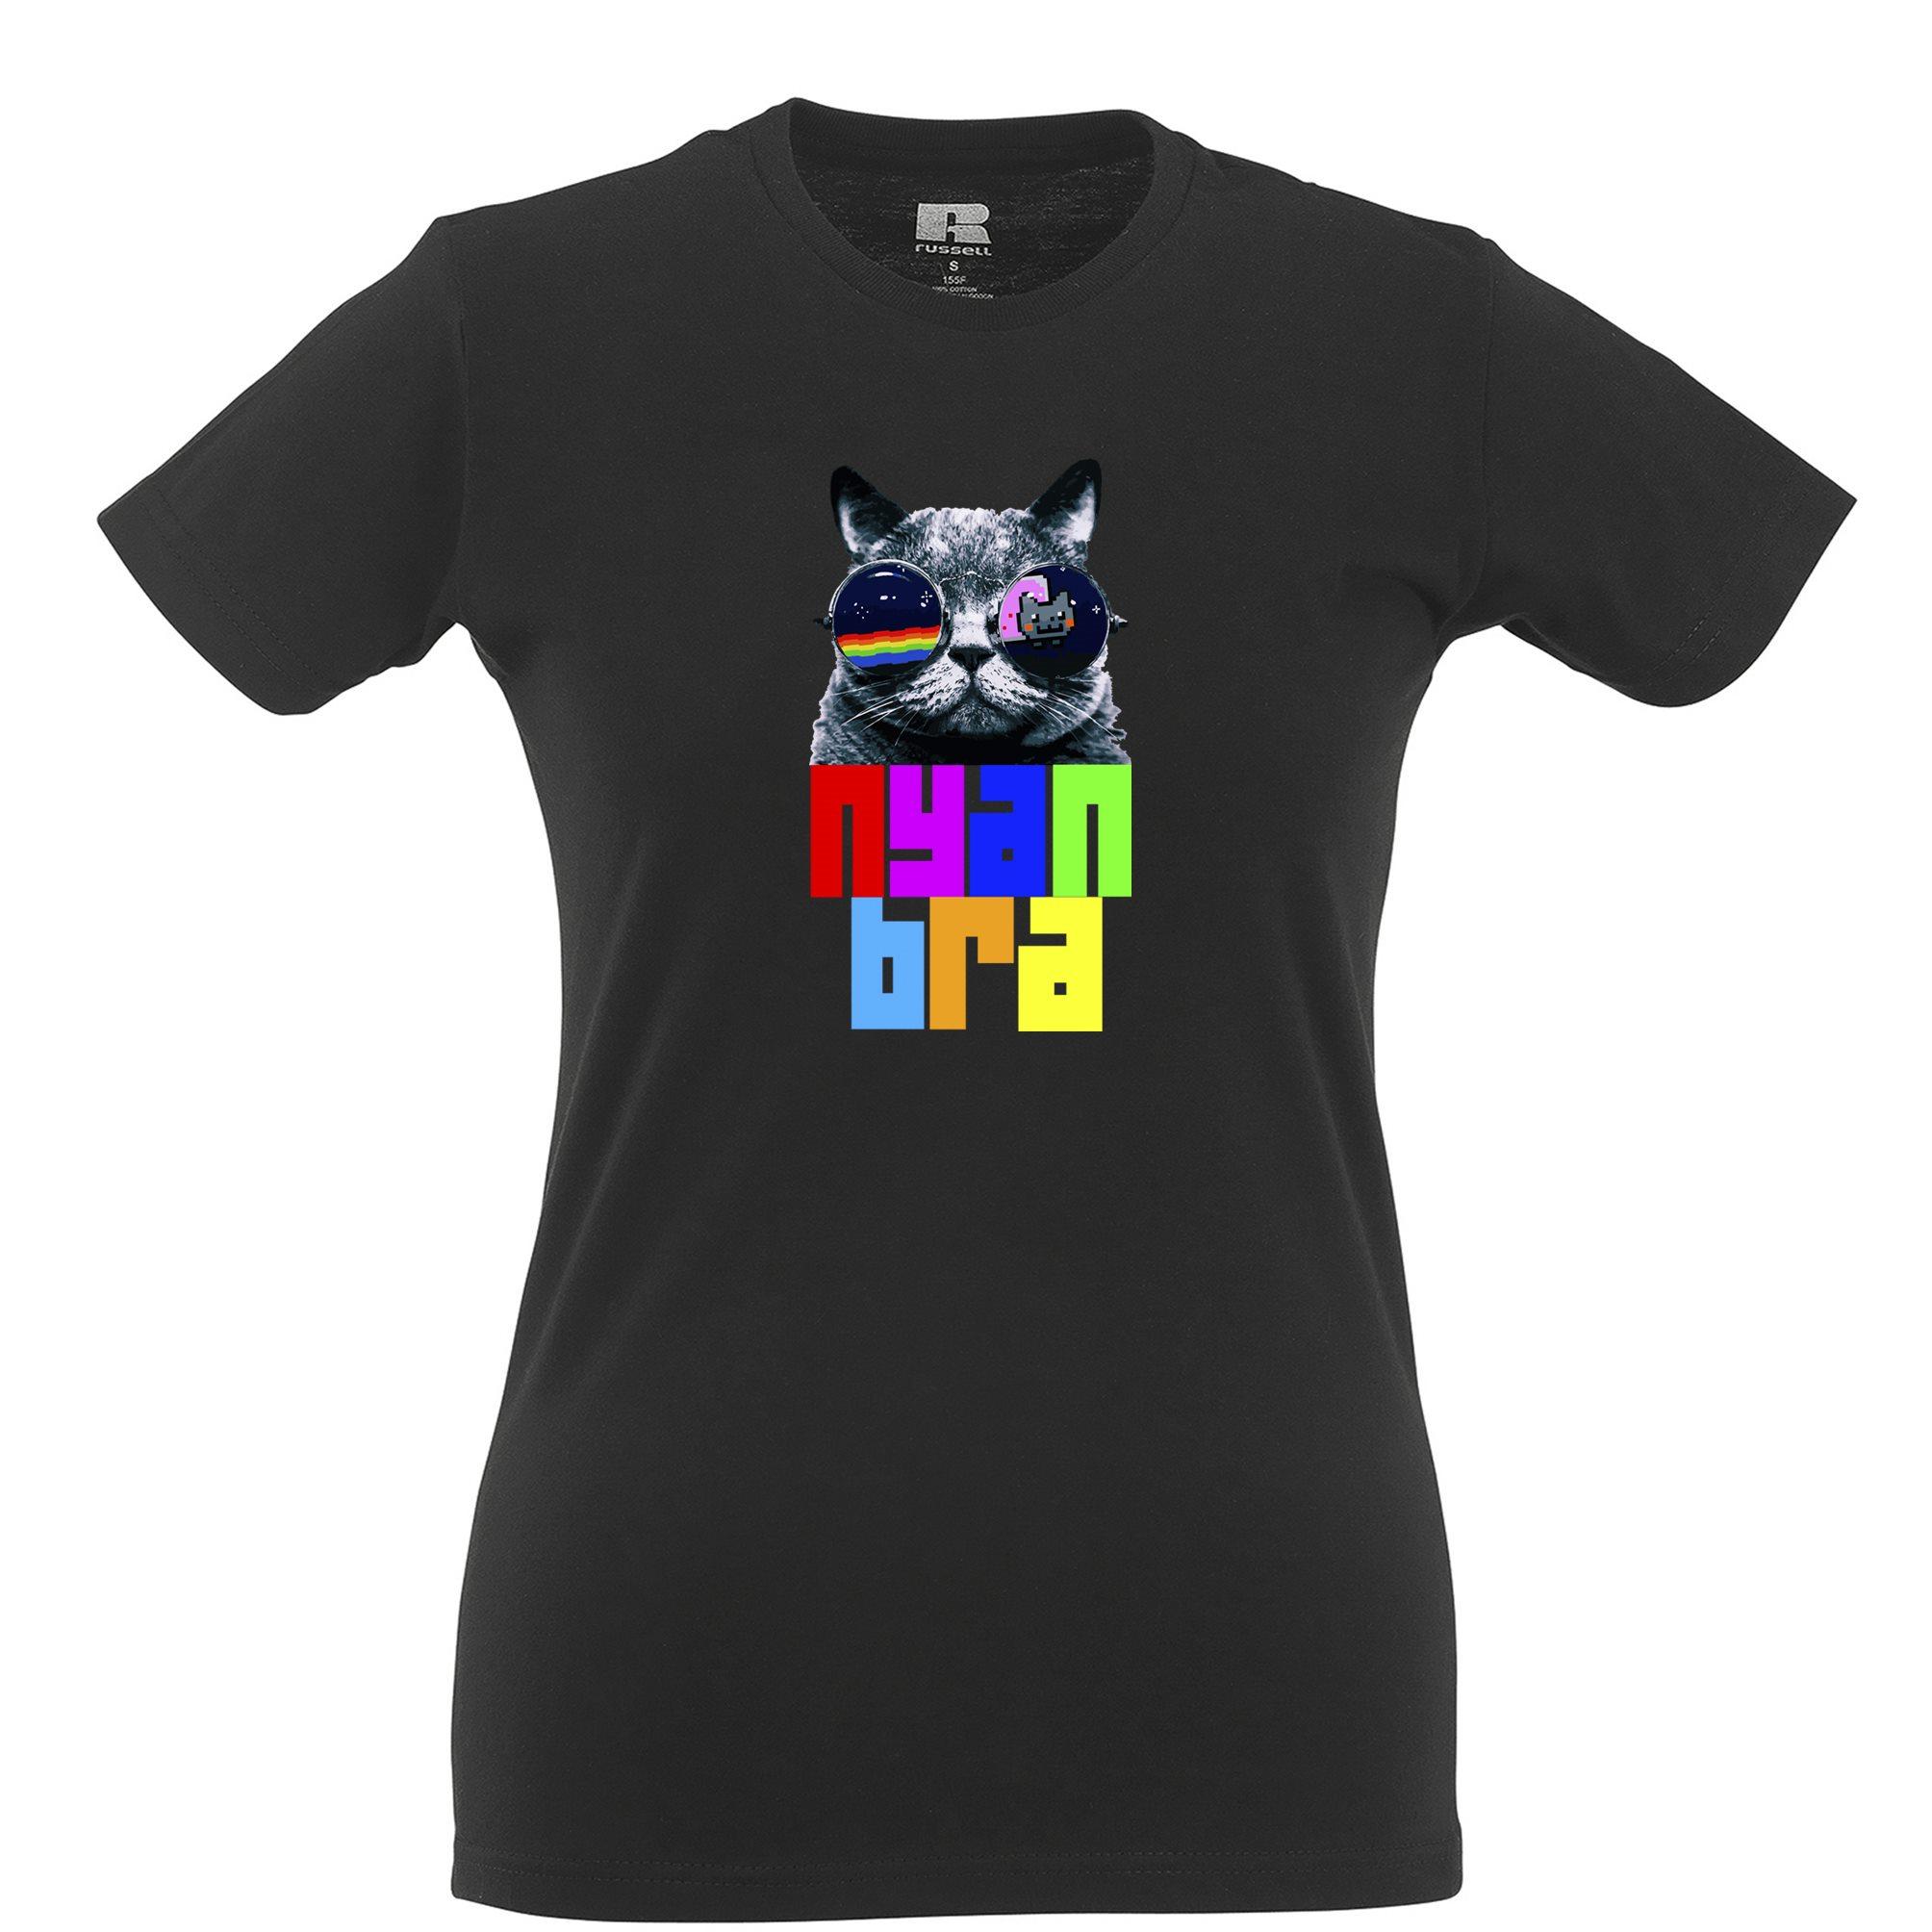 Funny Internet Meme T Shirts : Nyan cat bra cool funny t shirt youtube internet meme